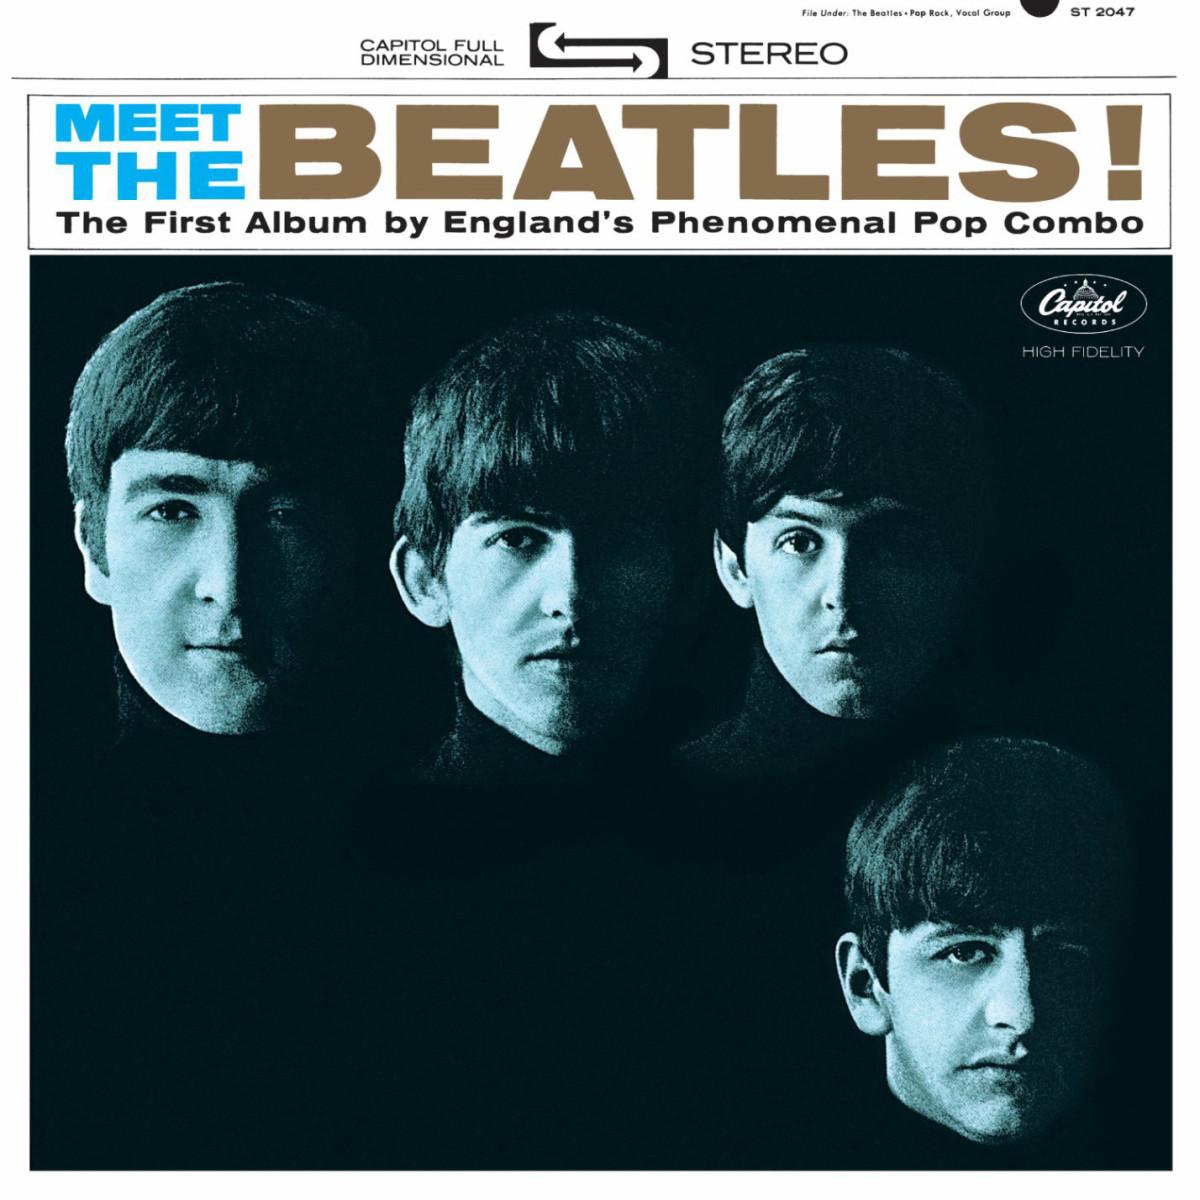 The Beatles, Meet The Beatles